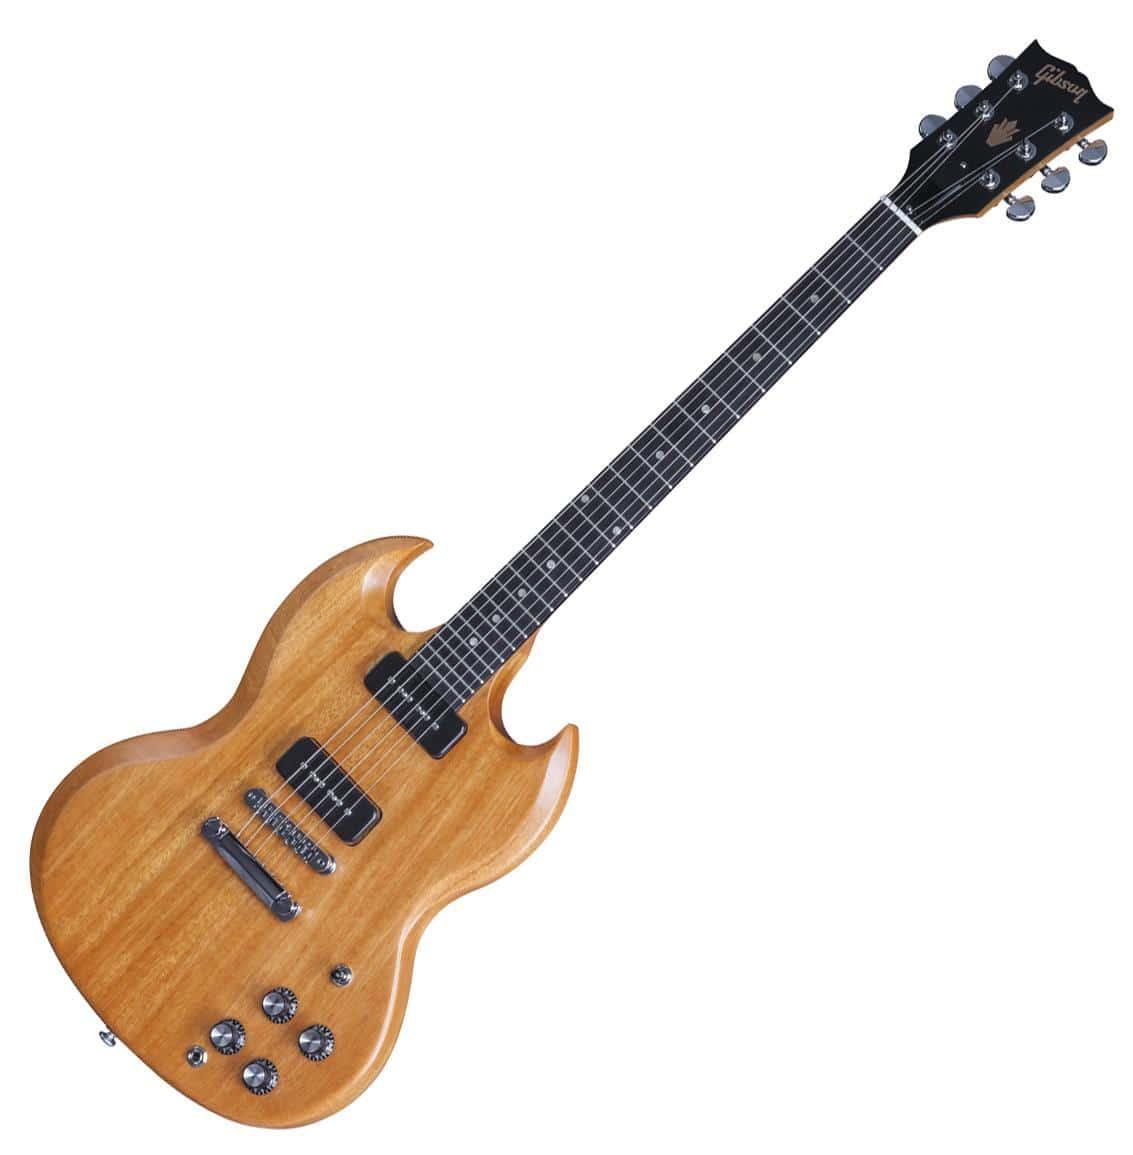 Gibson SG Naked 2016 Natural Vintage Gloss Limited Run